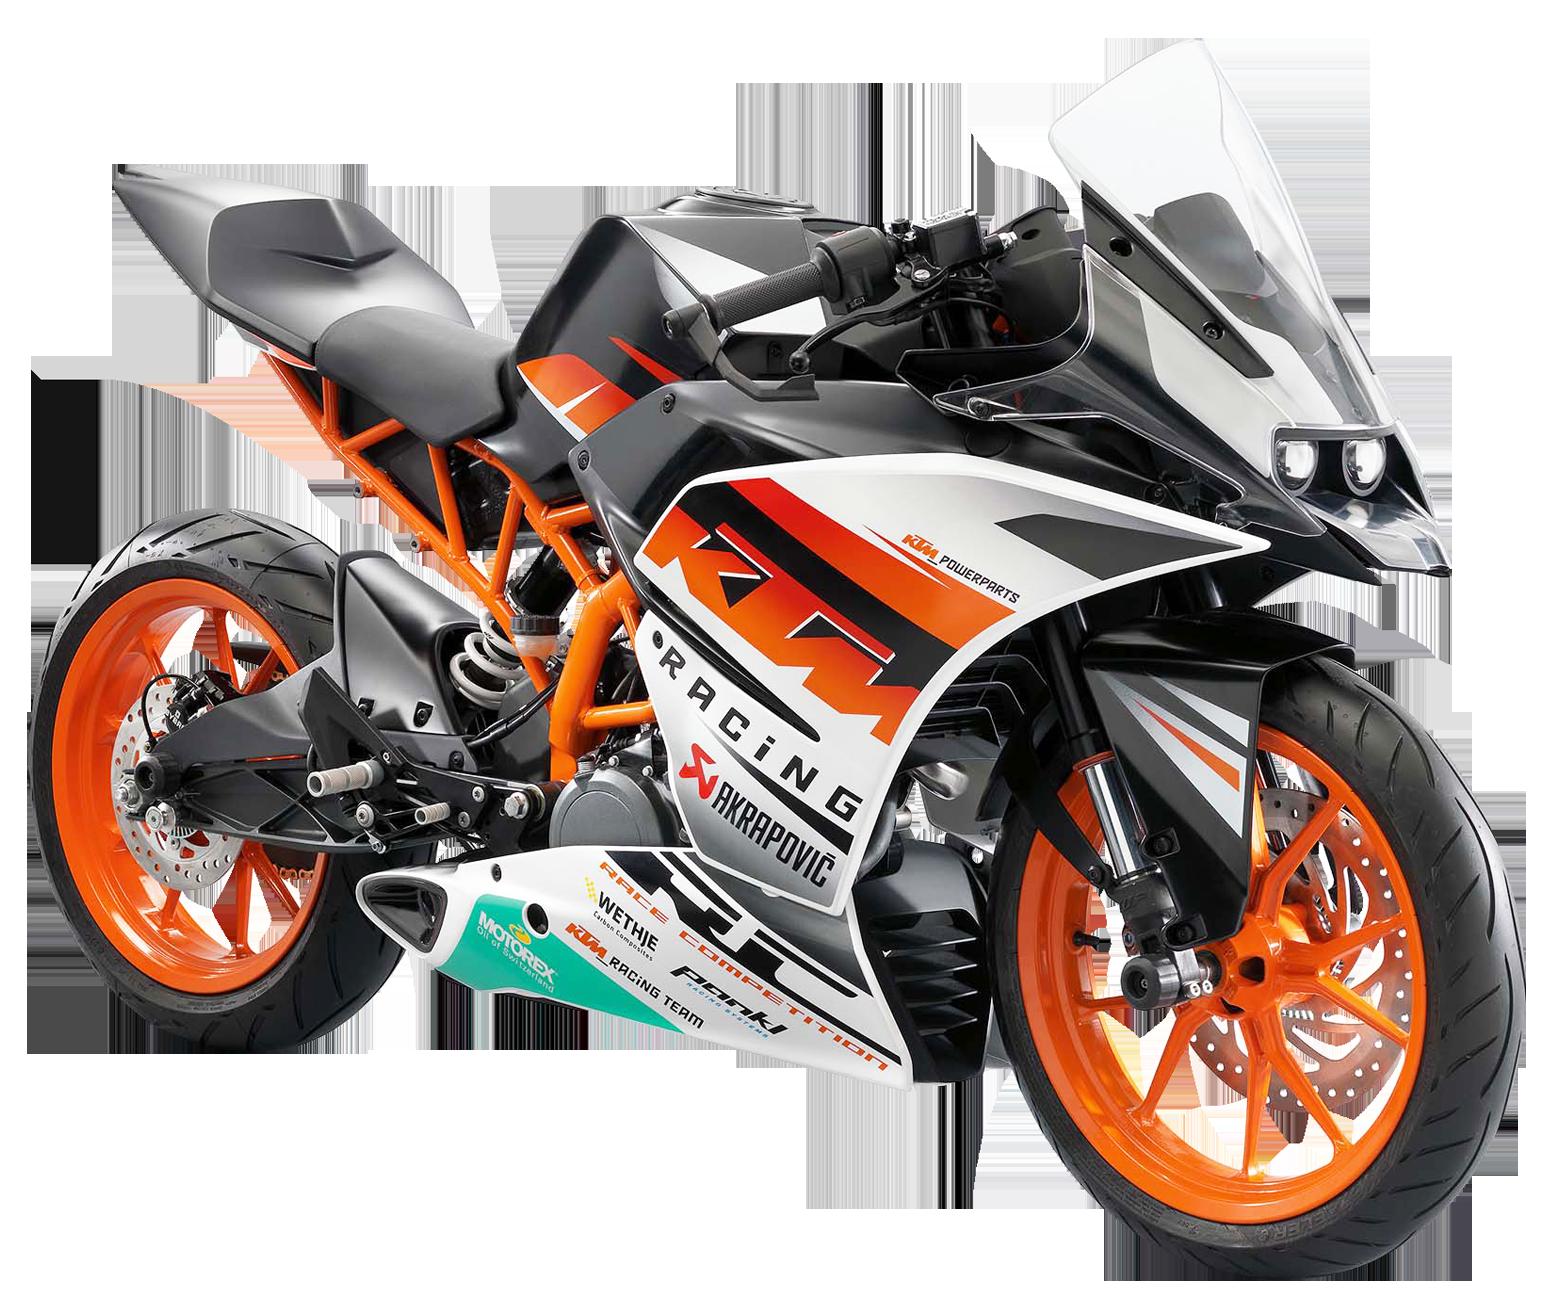 KTM RC390 Motorcycle Bike PNG Image.